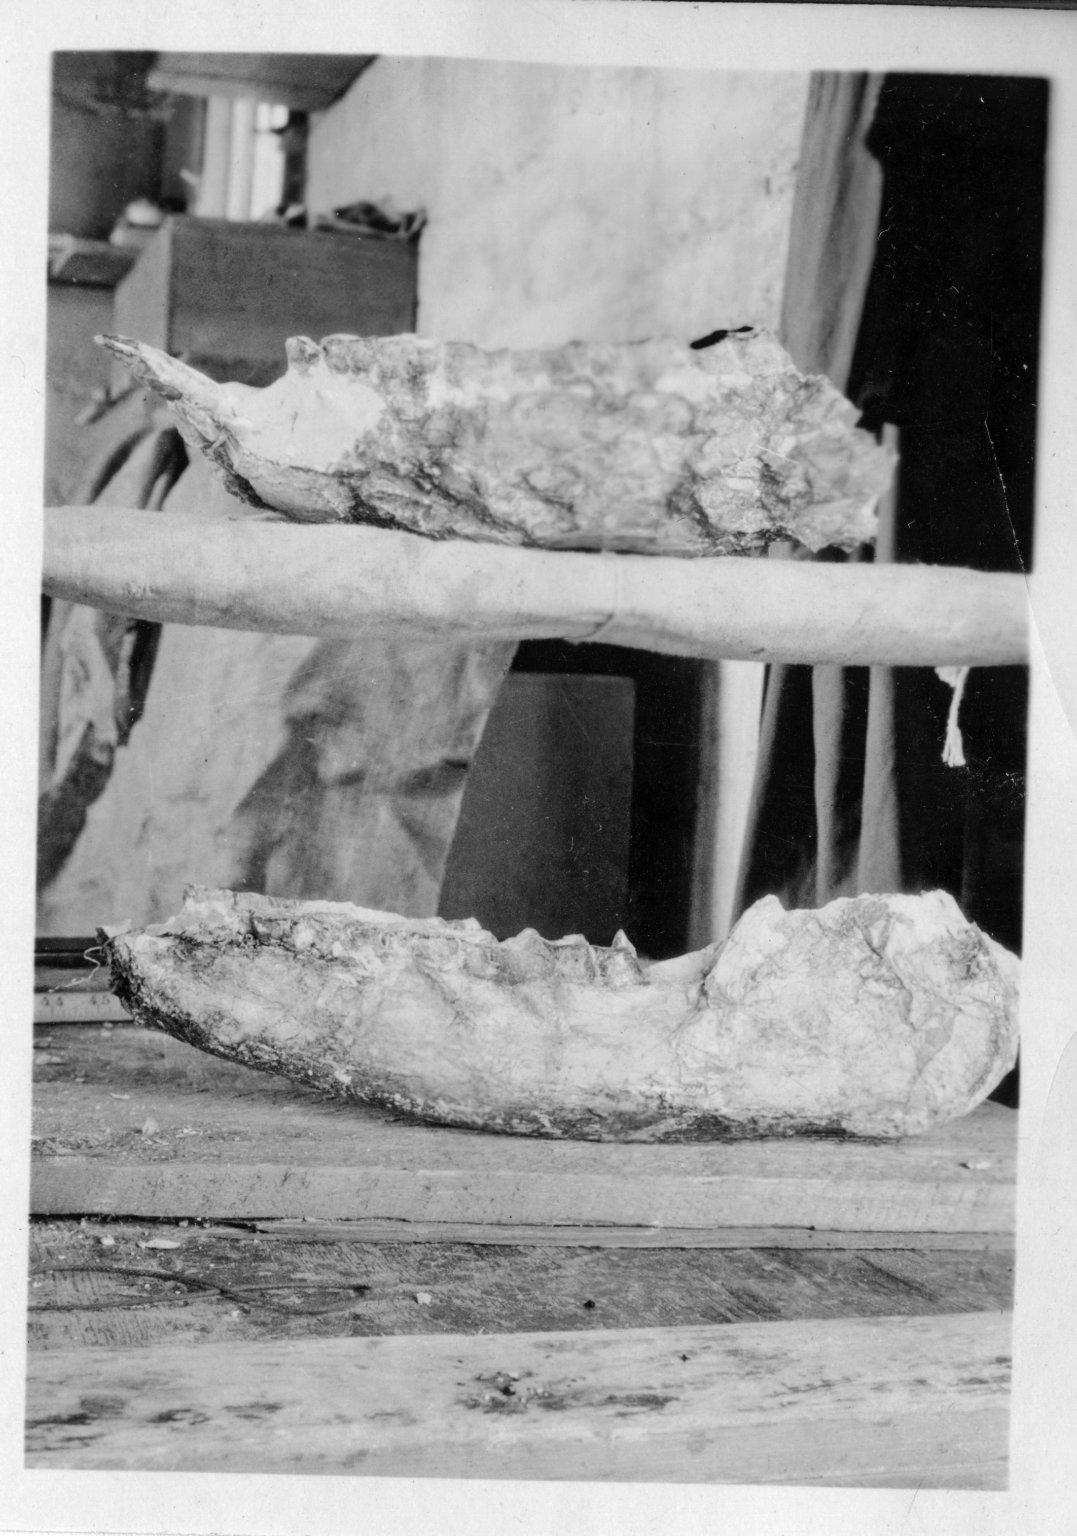 Jawbone Fossil, Horsetail Creek Excavation